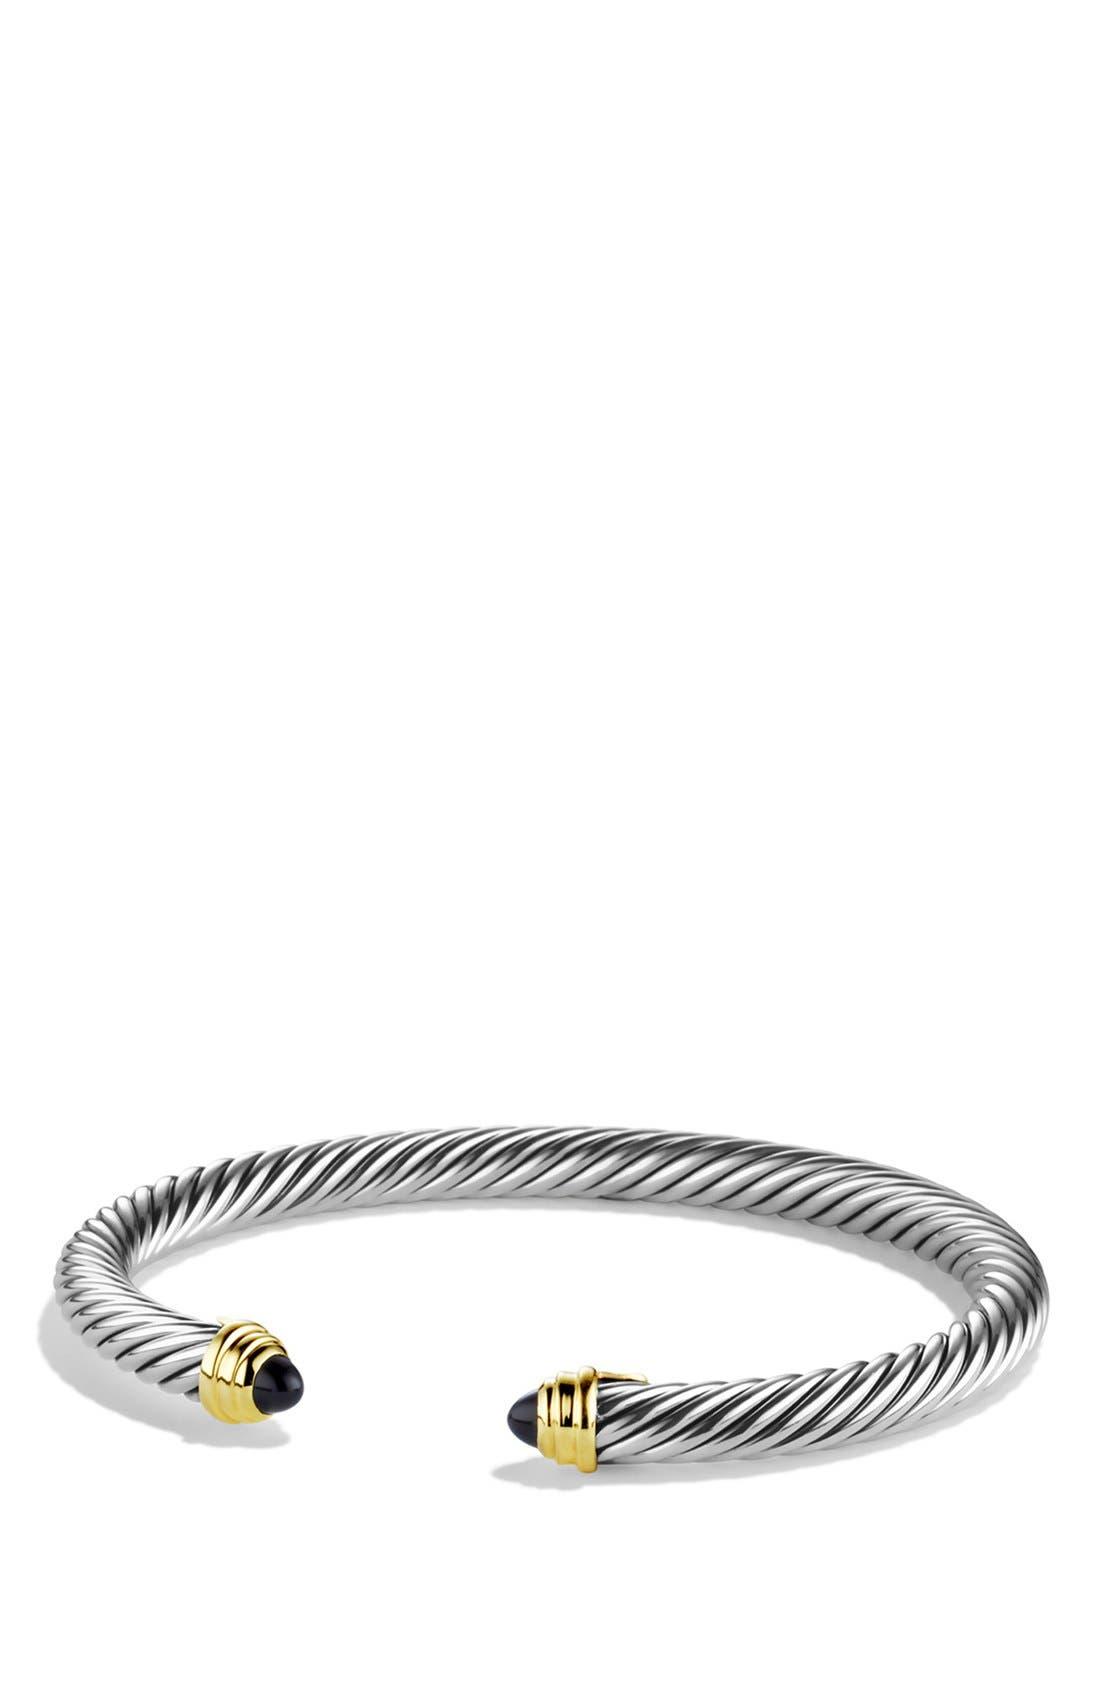 DAVID YURMAN Cable Classics Bracelet with Semiprecious Stones & 14K Gold, 5mm, Main, color, BLACK ONYX